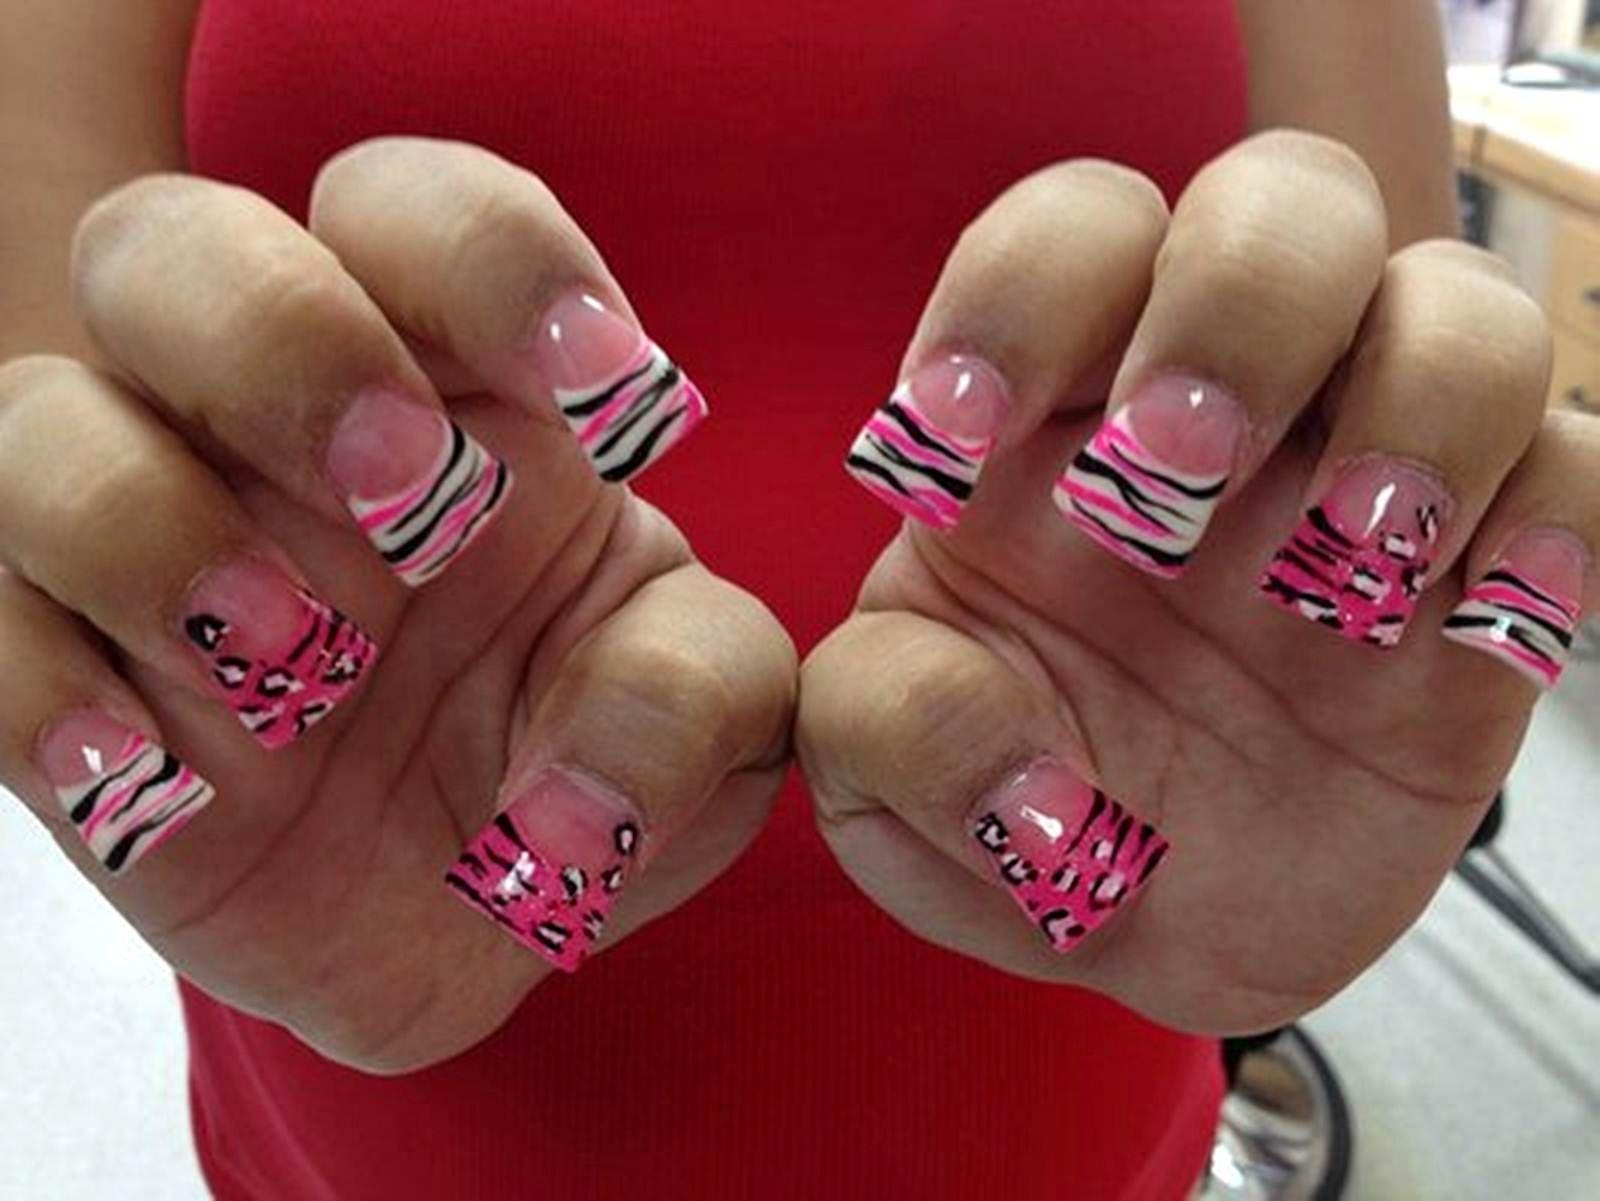 acrylic nails designs cheetah | Nails I want to try ...